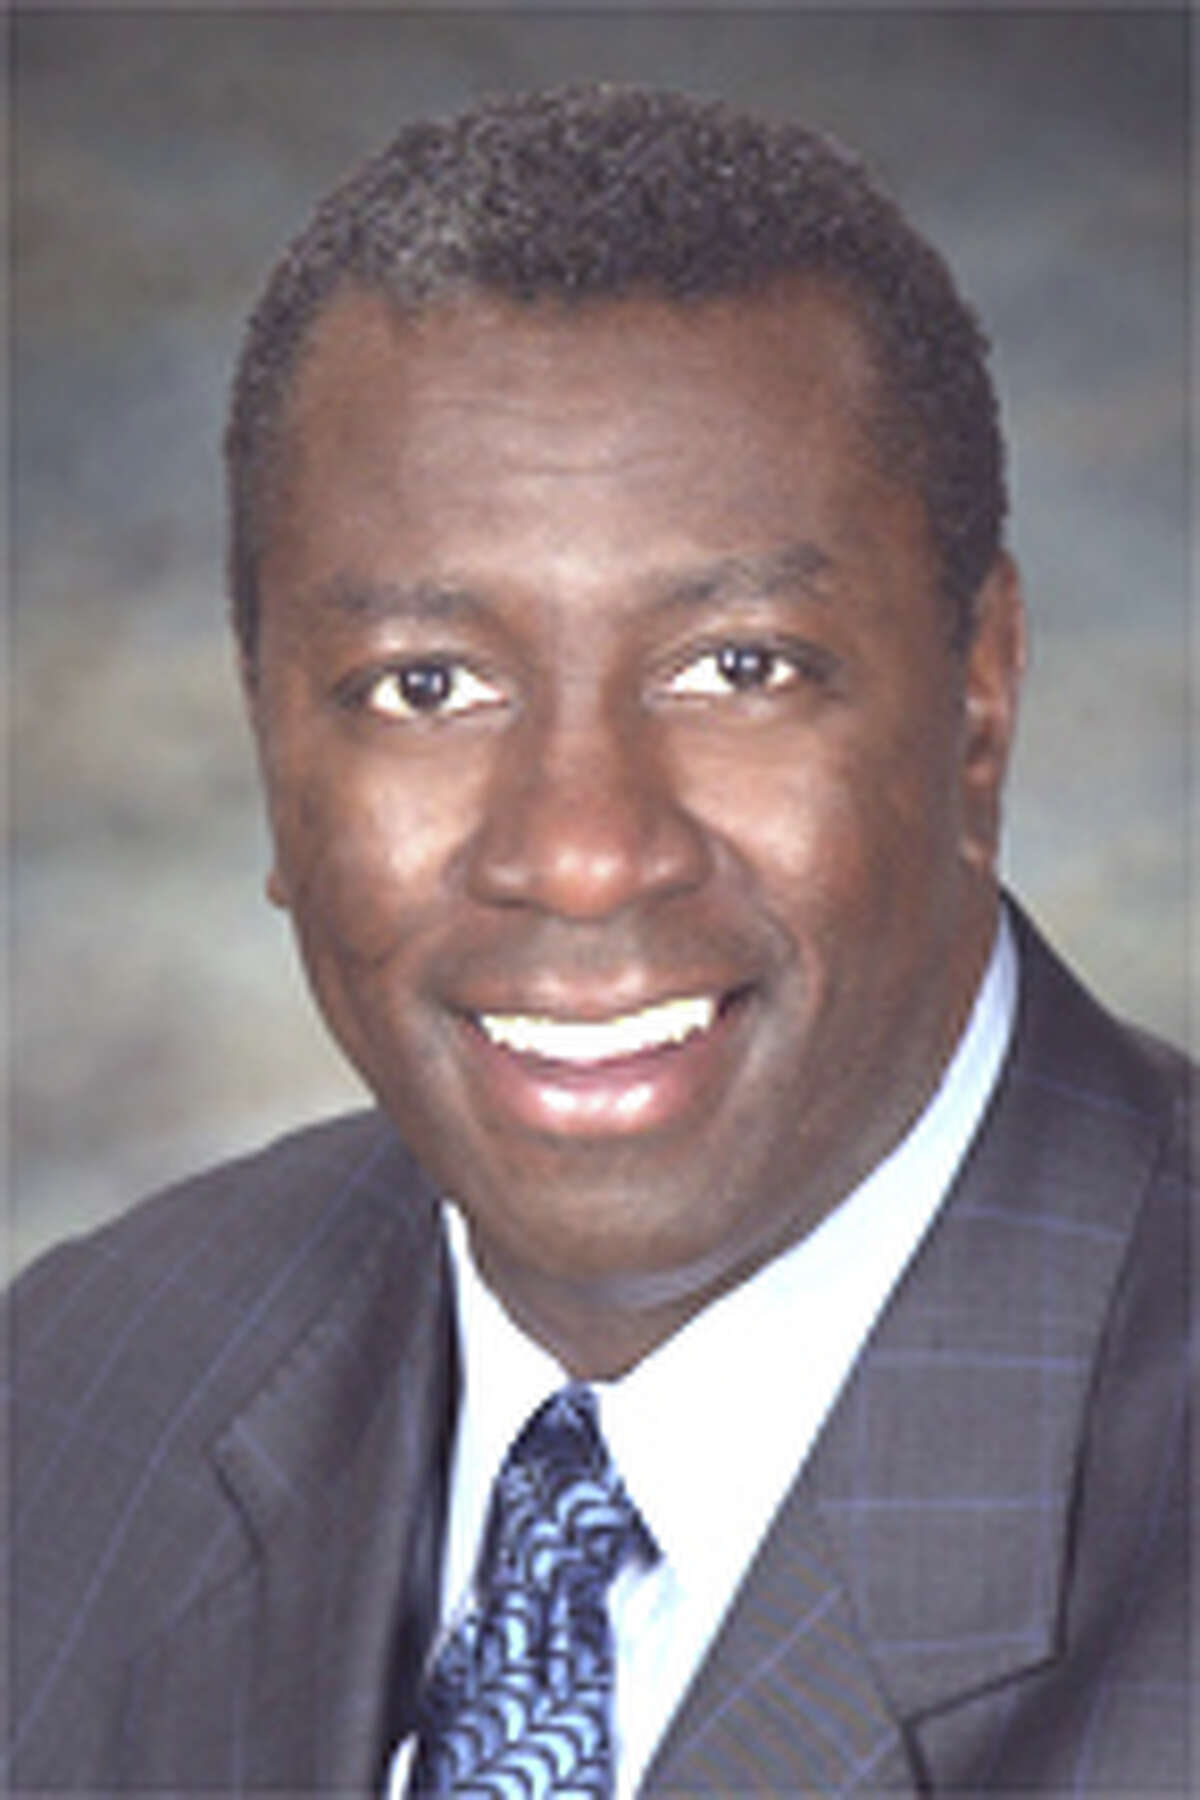 CHRISTOPHER W. OLIVER -- District IX